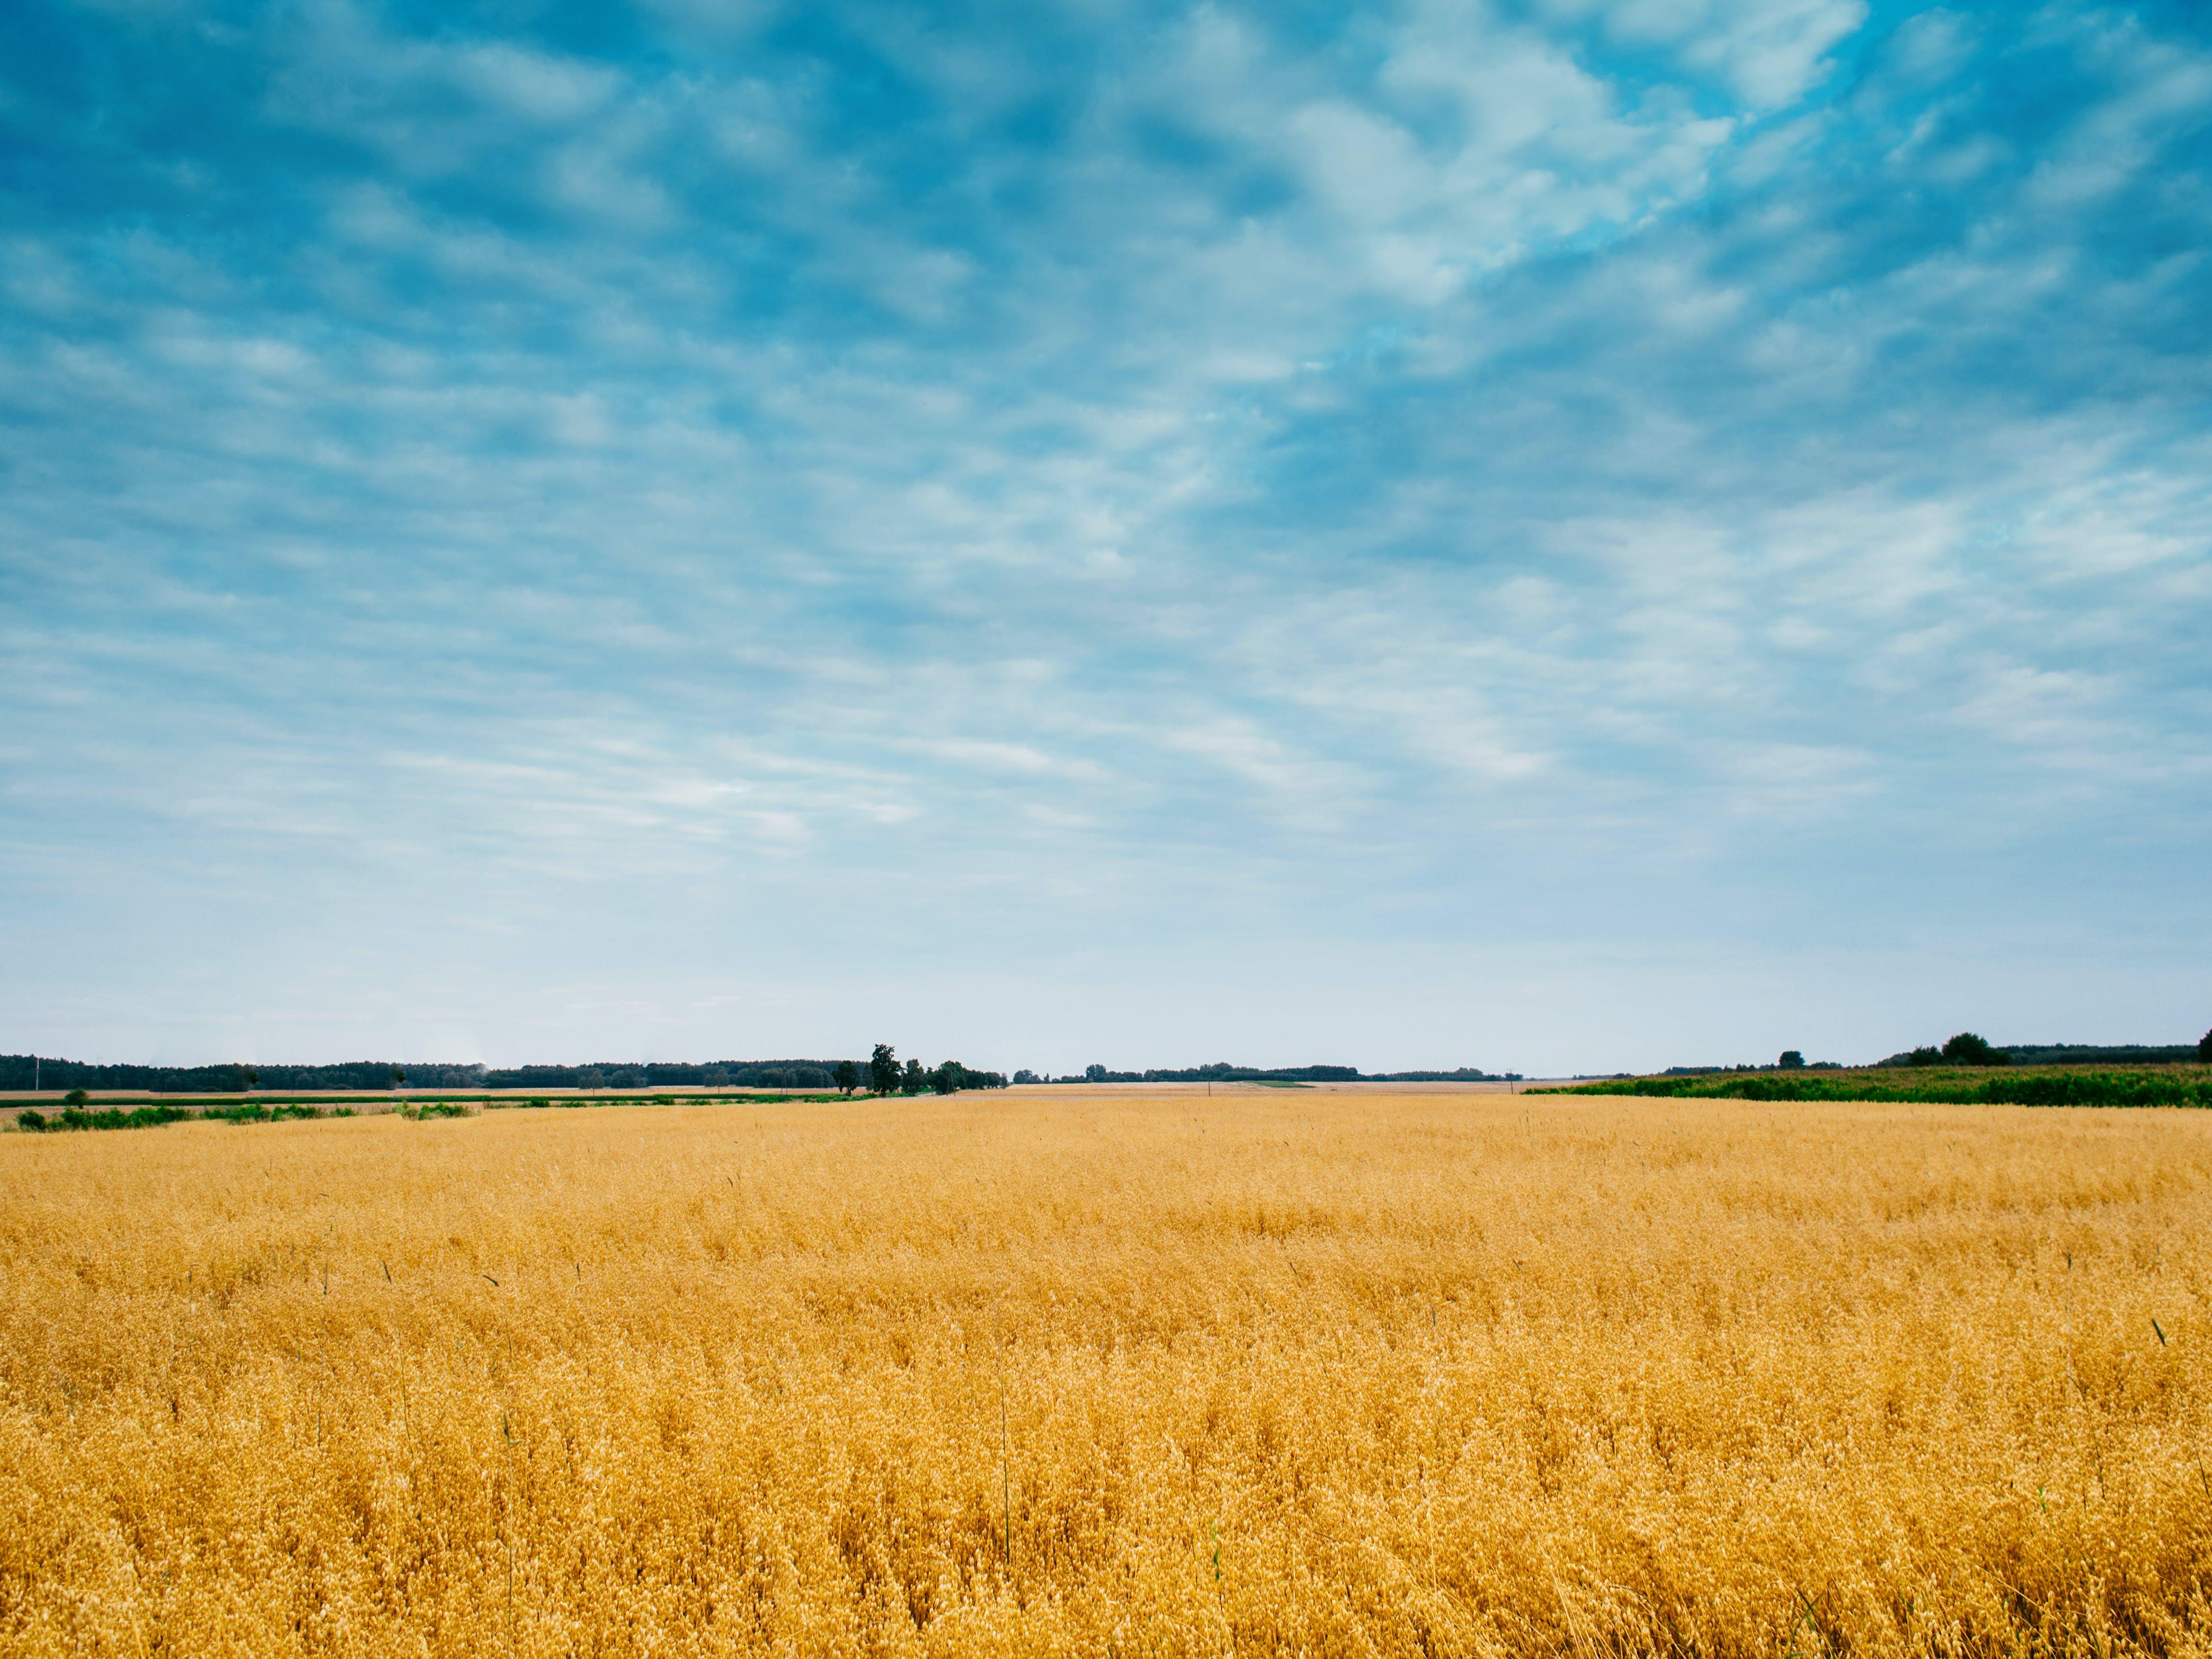 Fotobanka sbezplatnými fotkami na tému hracie pole, kukuričné pole, obloha